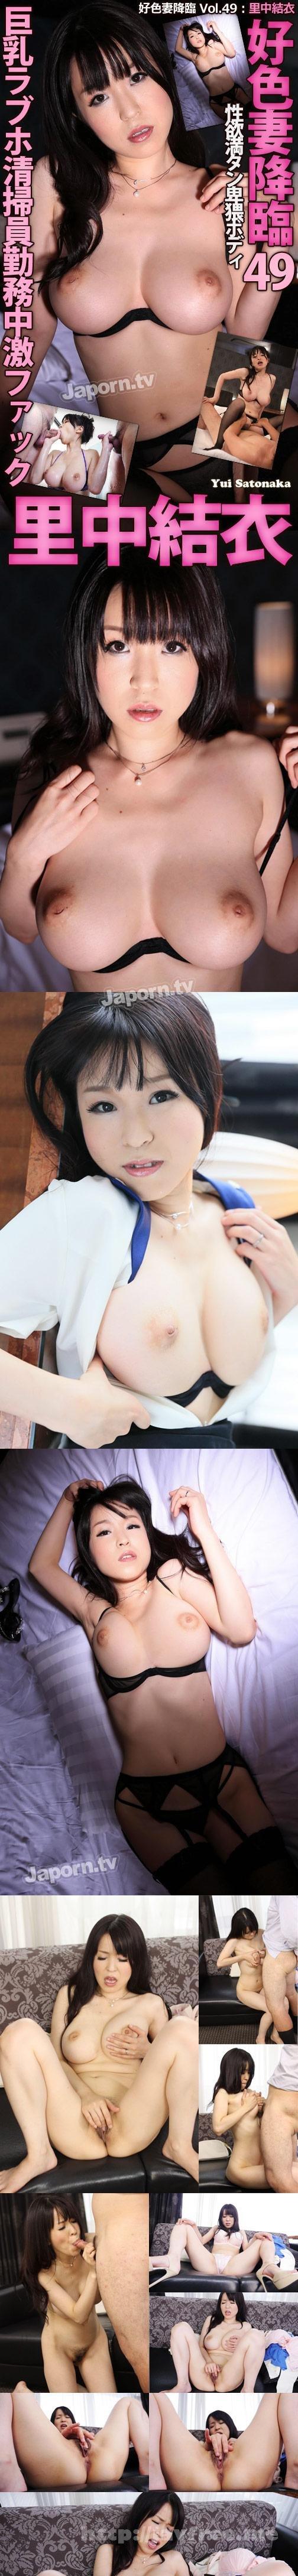 [SKY 308] 好色妻降臨 Vol.49 : 里中結衣 里中結衣 Yui Satonaka SKY